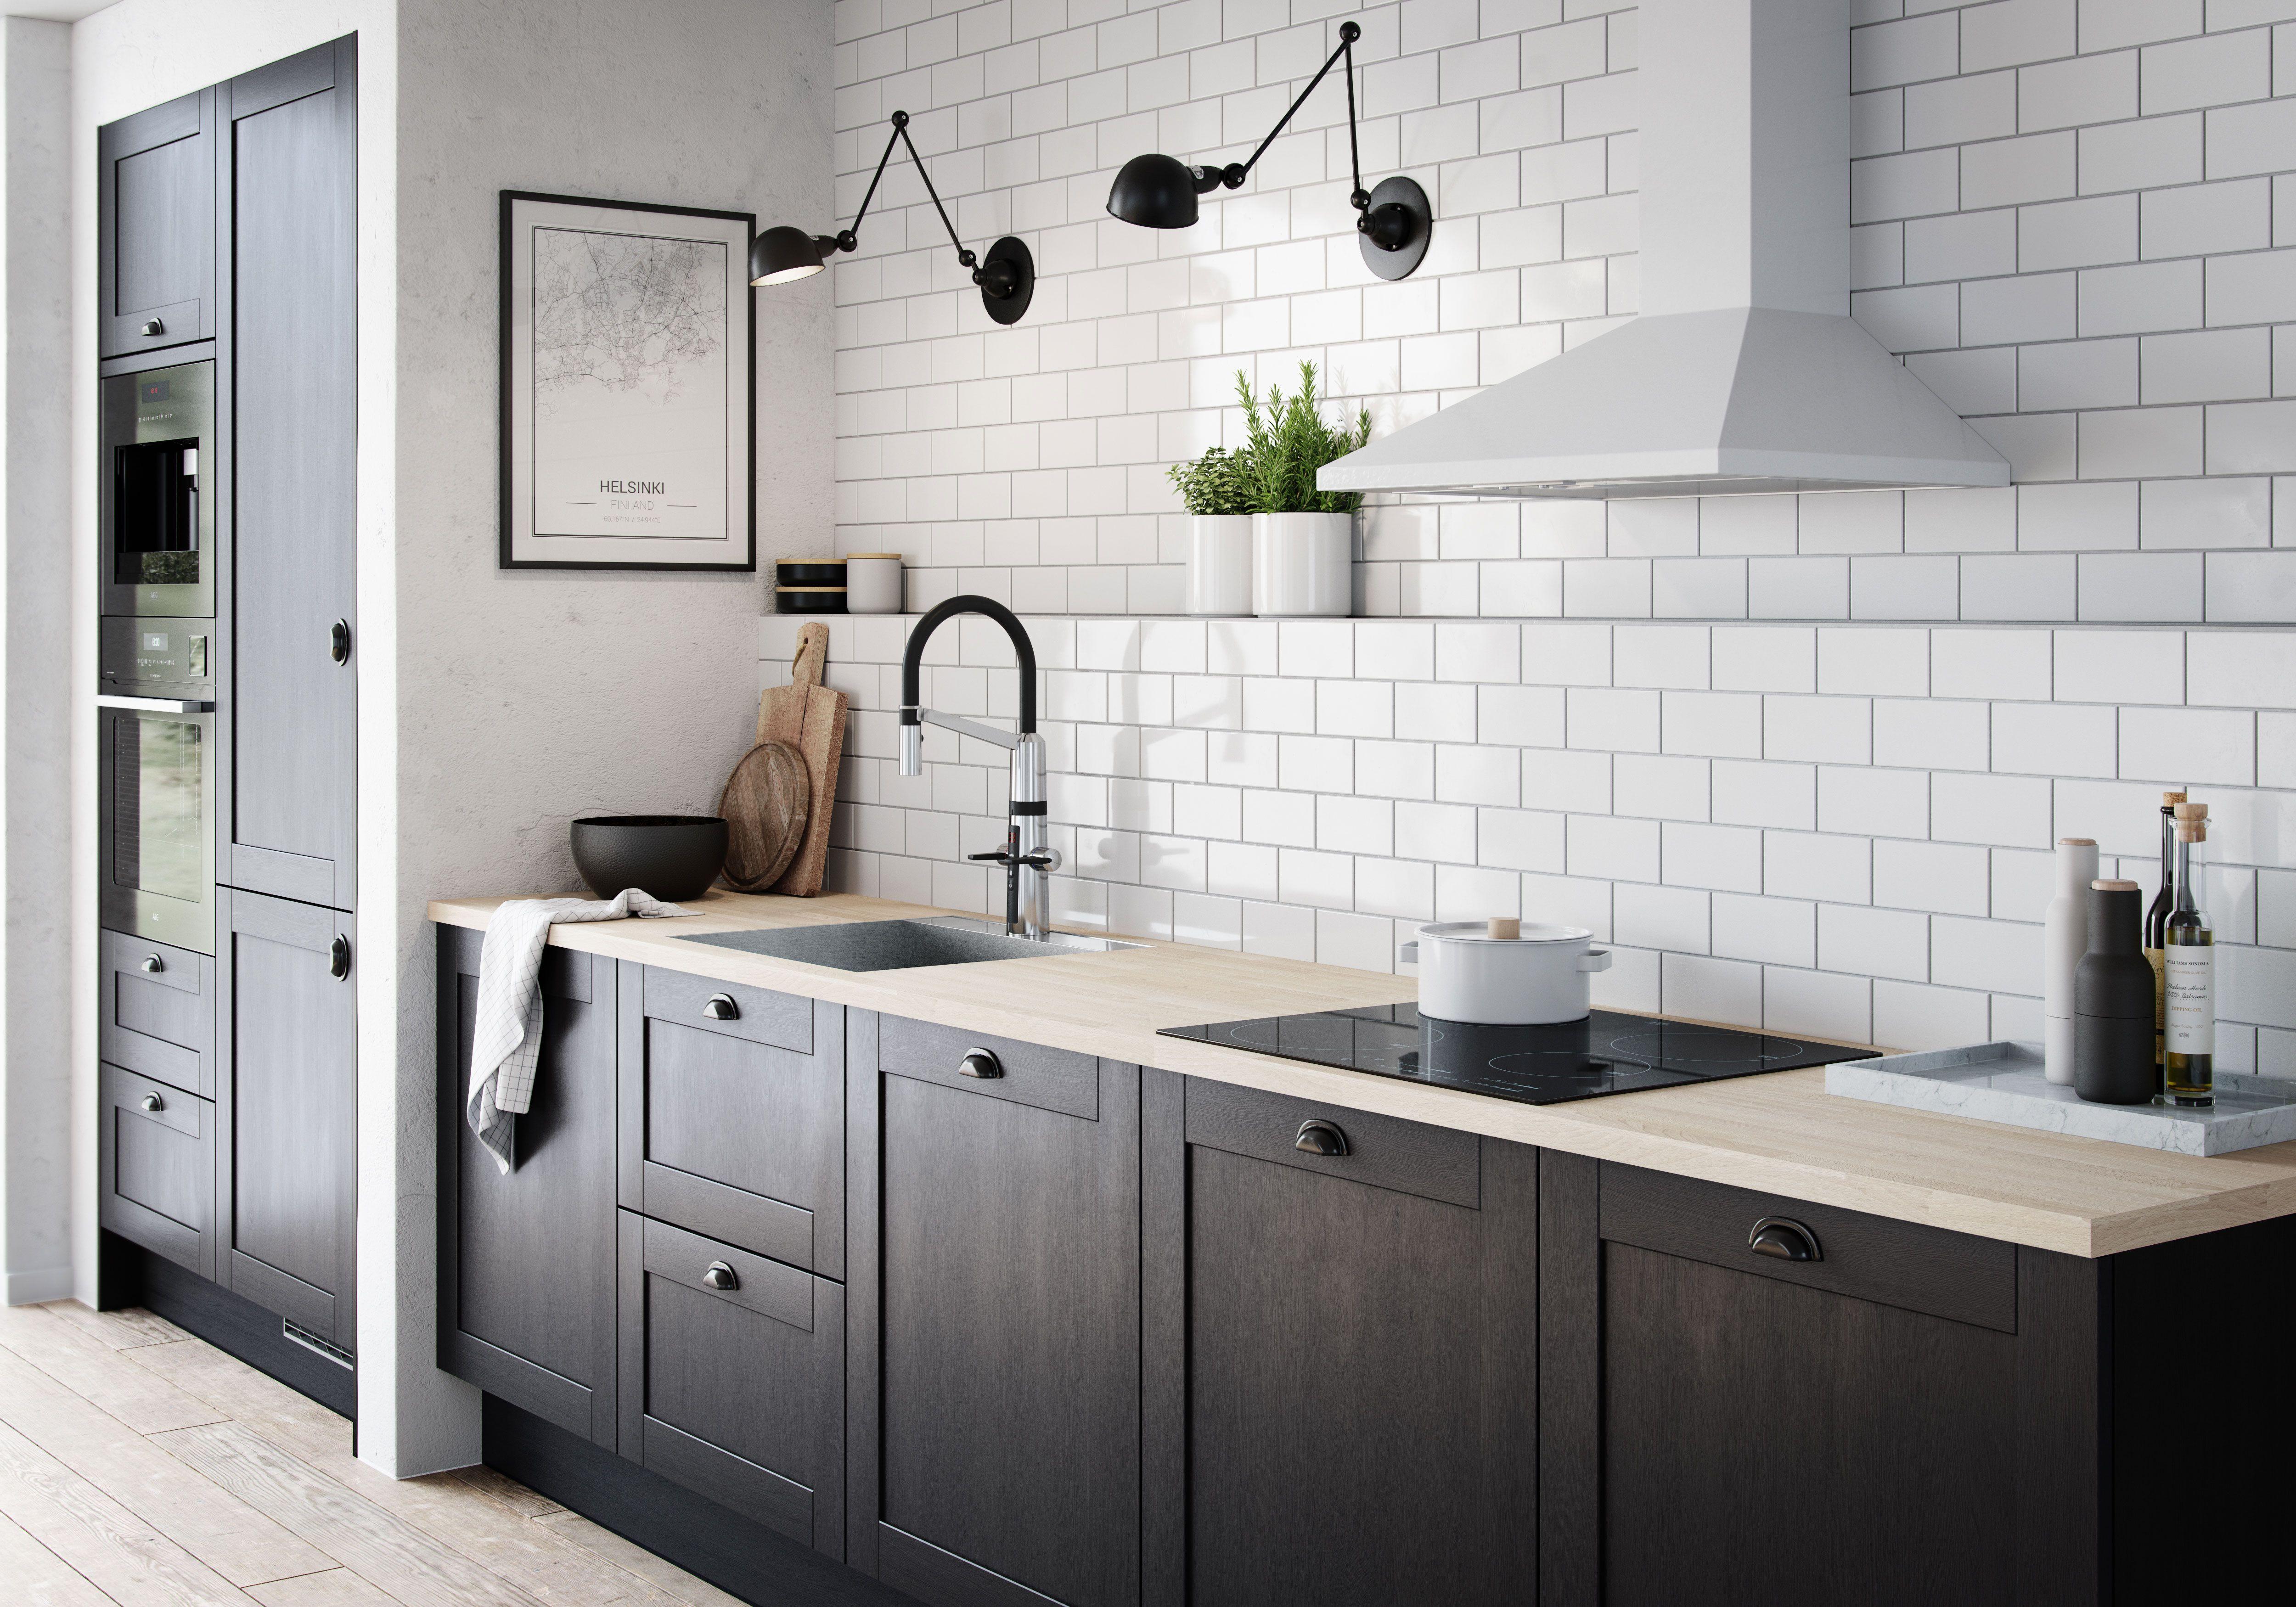 Oras Optima 2728f Kitchen Faucet 230 5 V Oras Classic Kitchen